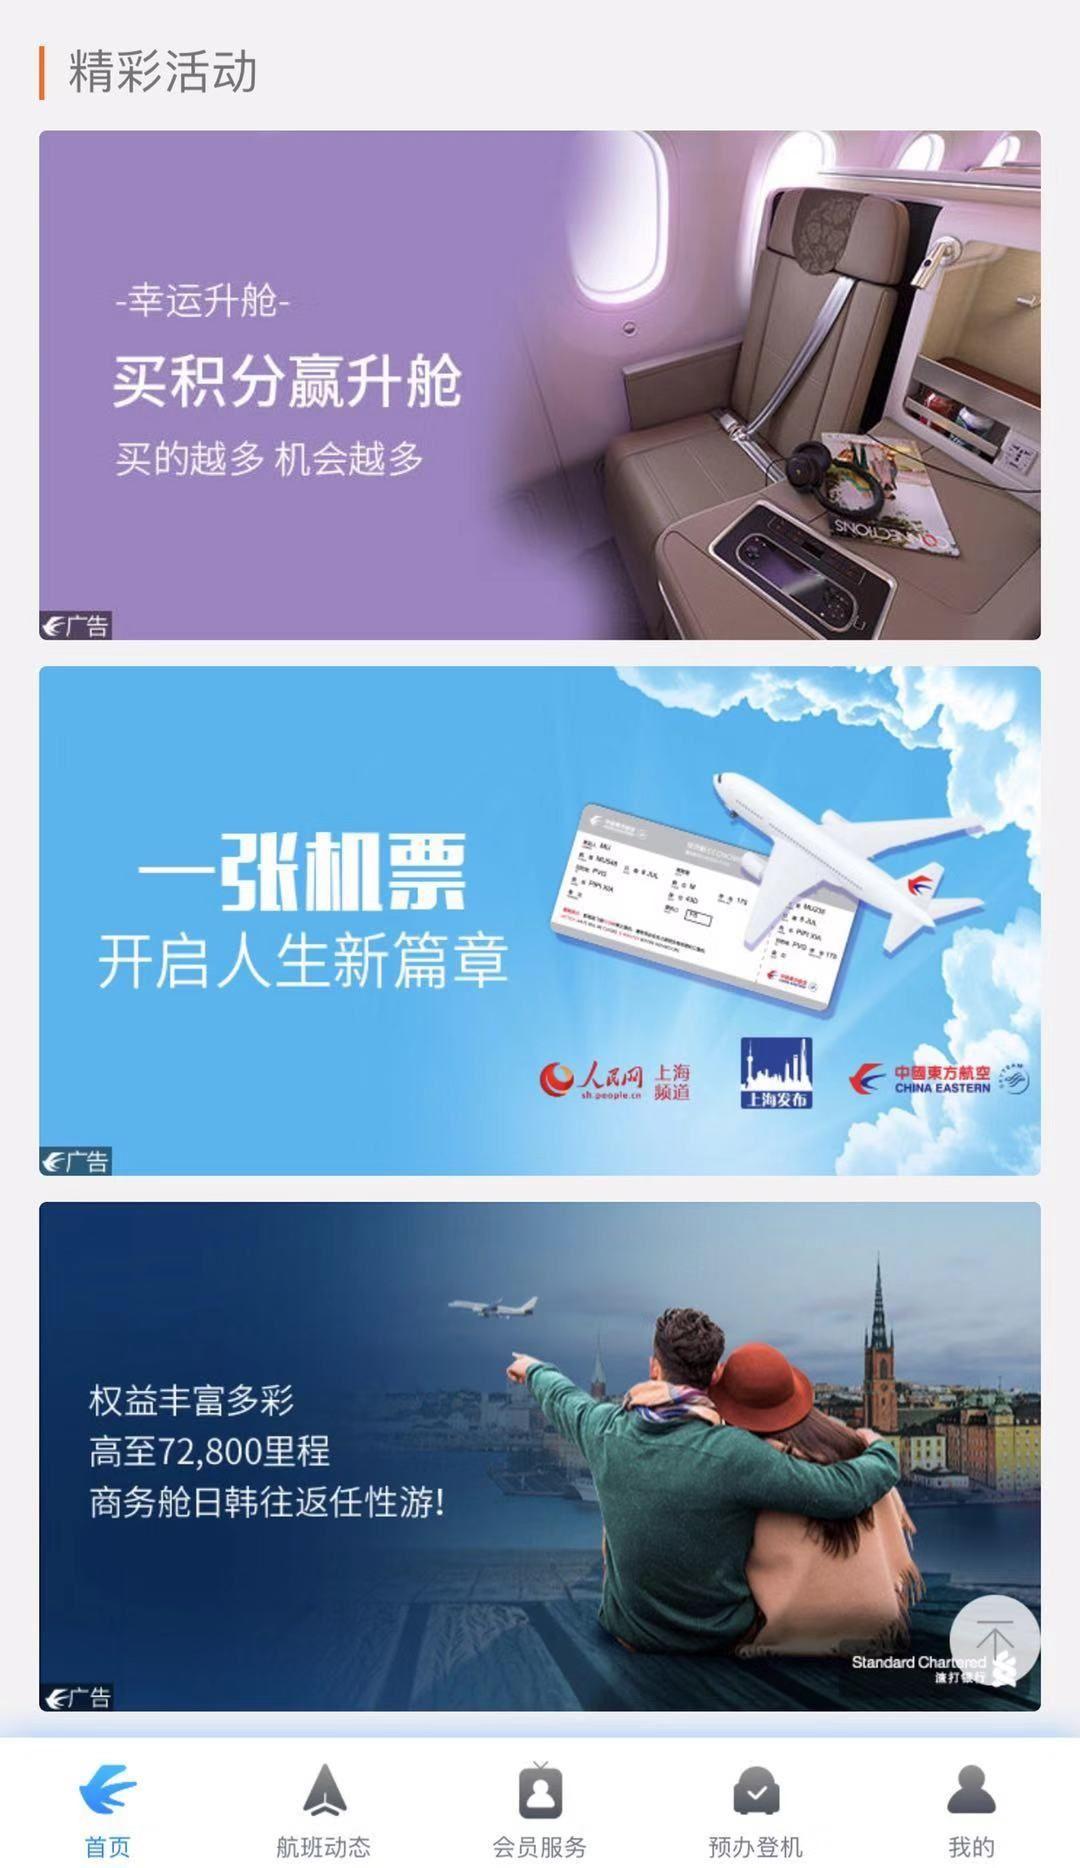 东方航空APP首页——精彩活动banner 摄影:东航